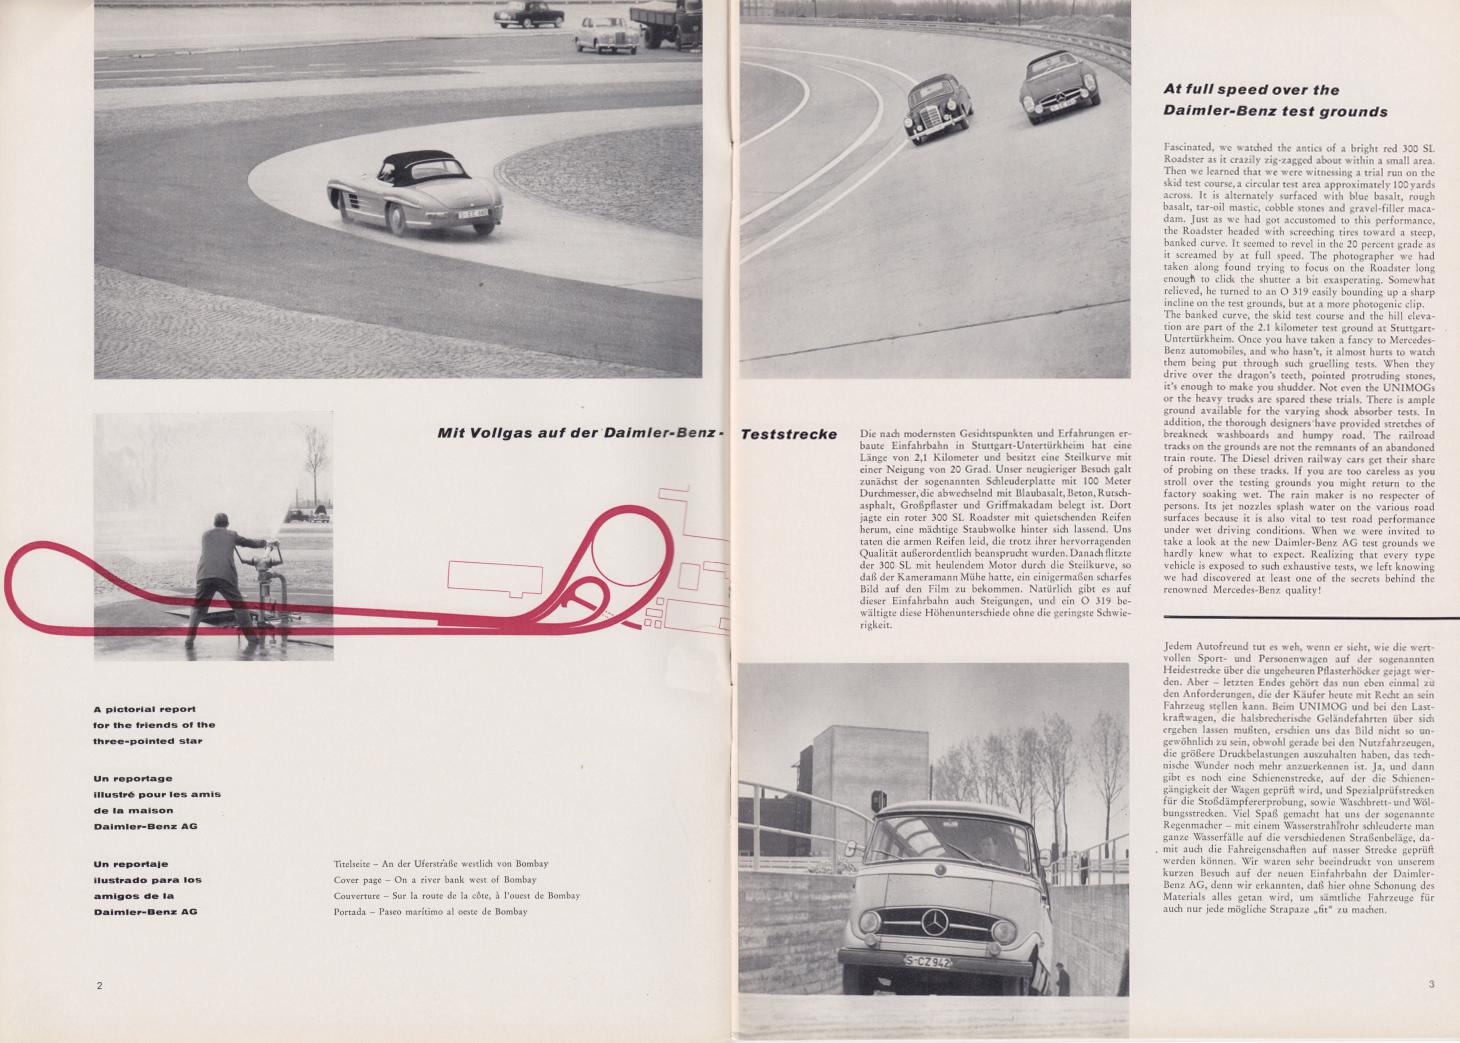 (REVISTA): Periódico In aller welt n.º 31 - Mercedes-Benz no mundo - 1959 - multilingue 002